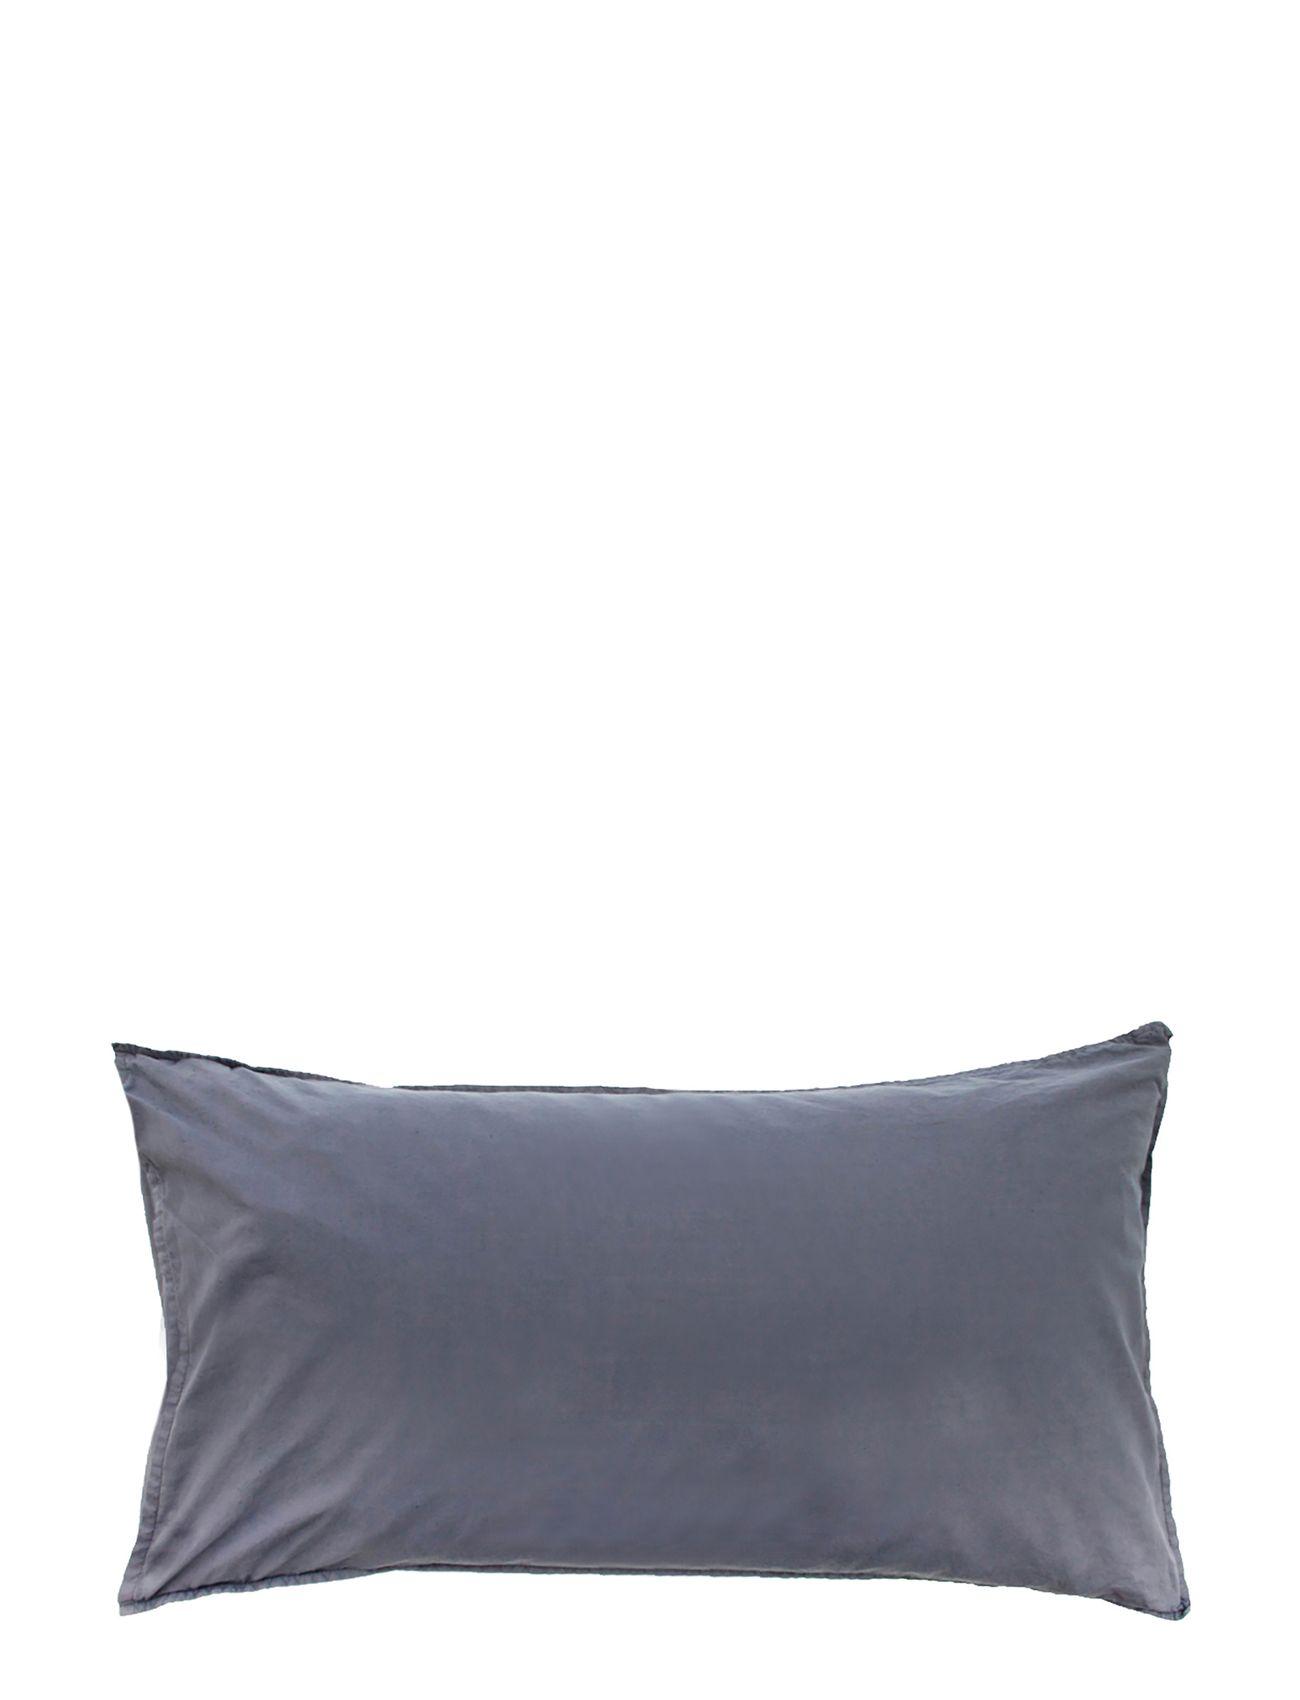 Himla Hope Plain Pillowcase Home Bedroom Pillowcases Sininen Himla